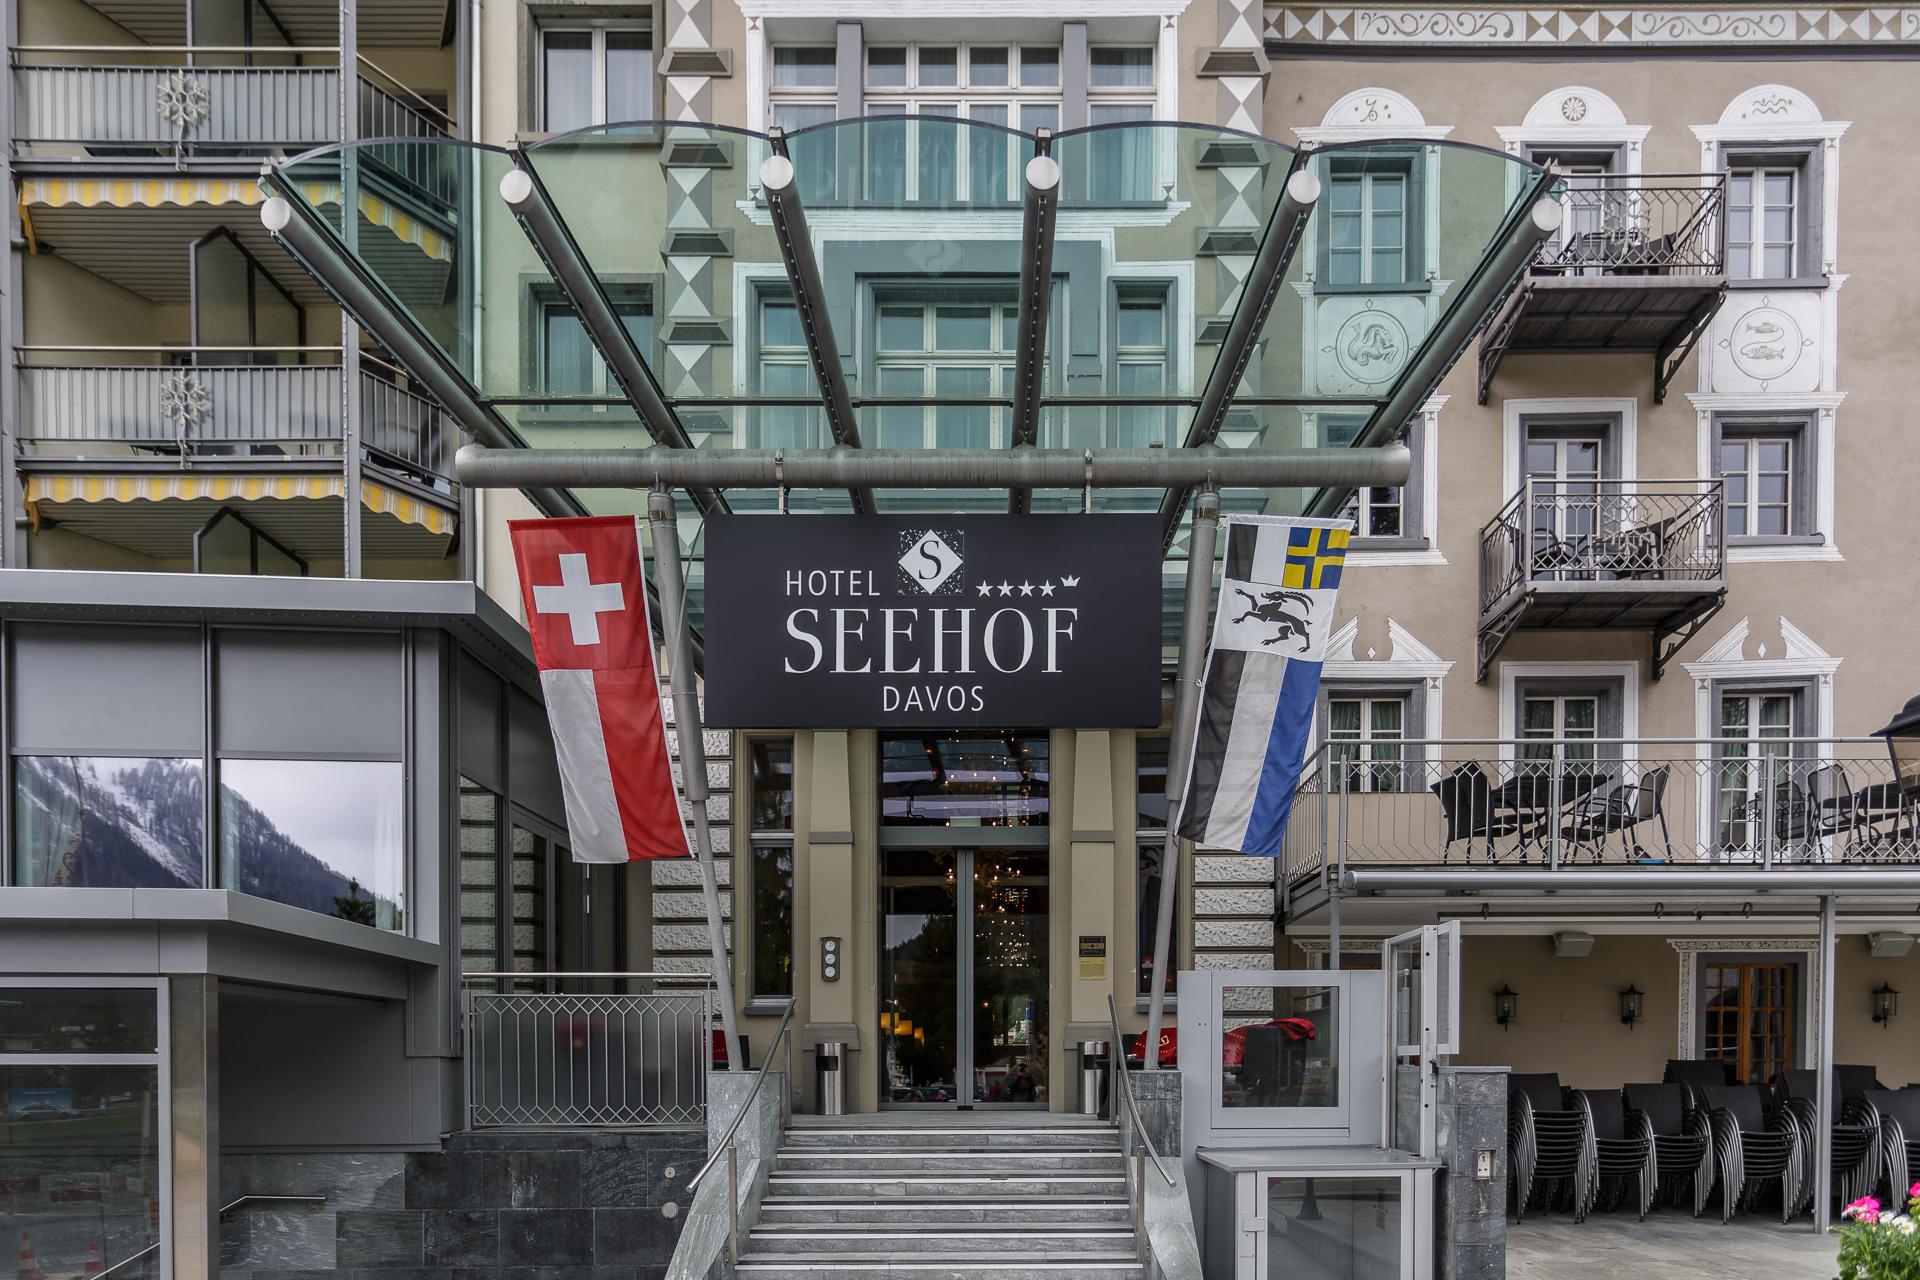 Hotel-Seehof-Davos